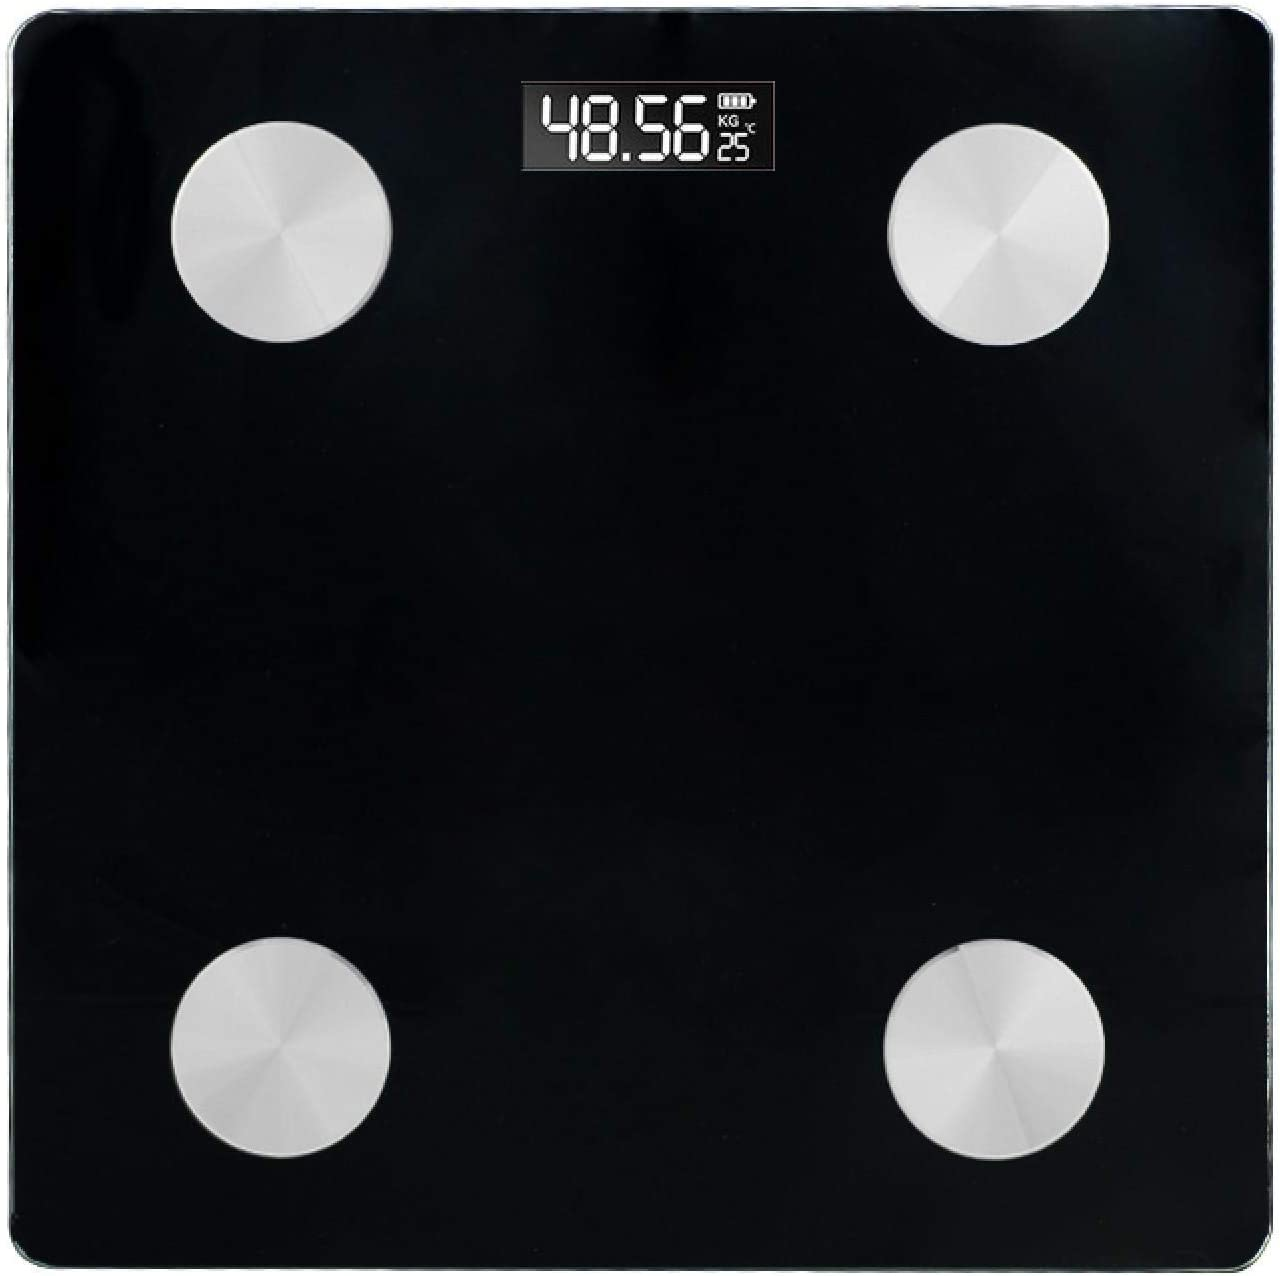 Balanza de grasa corporal balanza de baño Bluetooth piso cuerpo báscula IMC grasa báscula LED digital inteligente balanza de peso equilibrio corporal analizador de composición de cuerpo negro